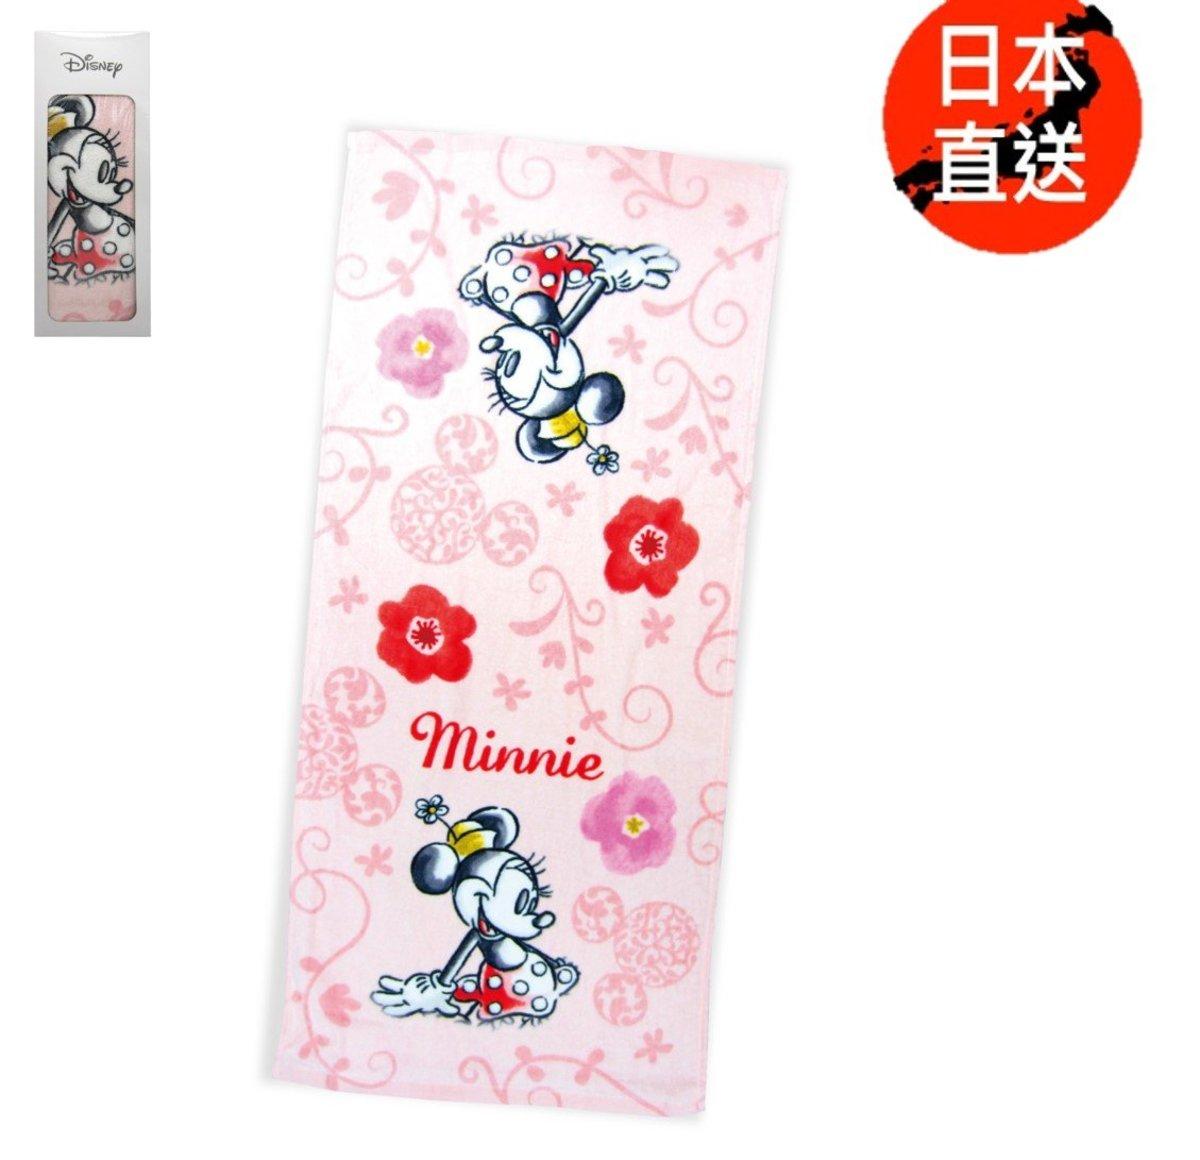 Towels gift set(Minnie)(Licensed by Disney)